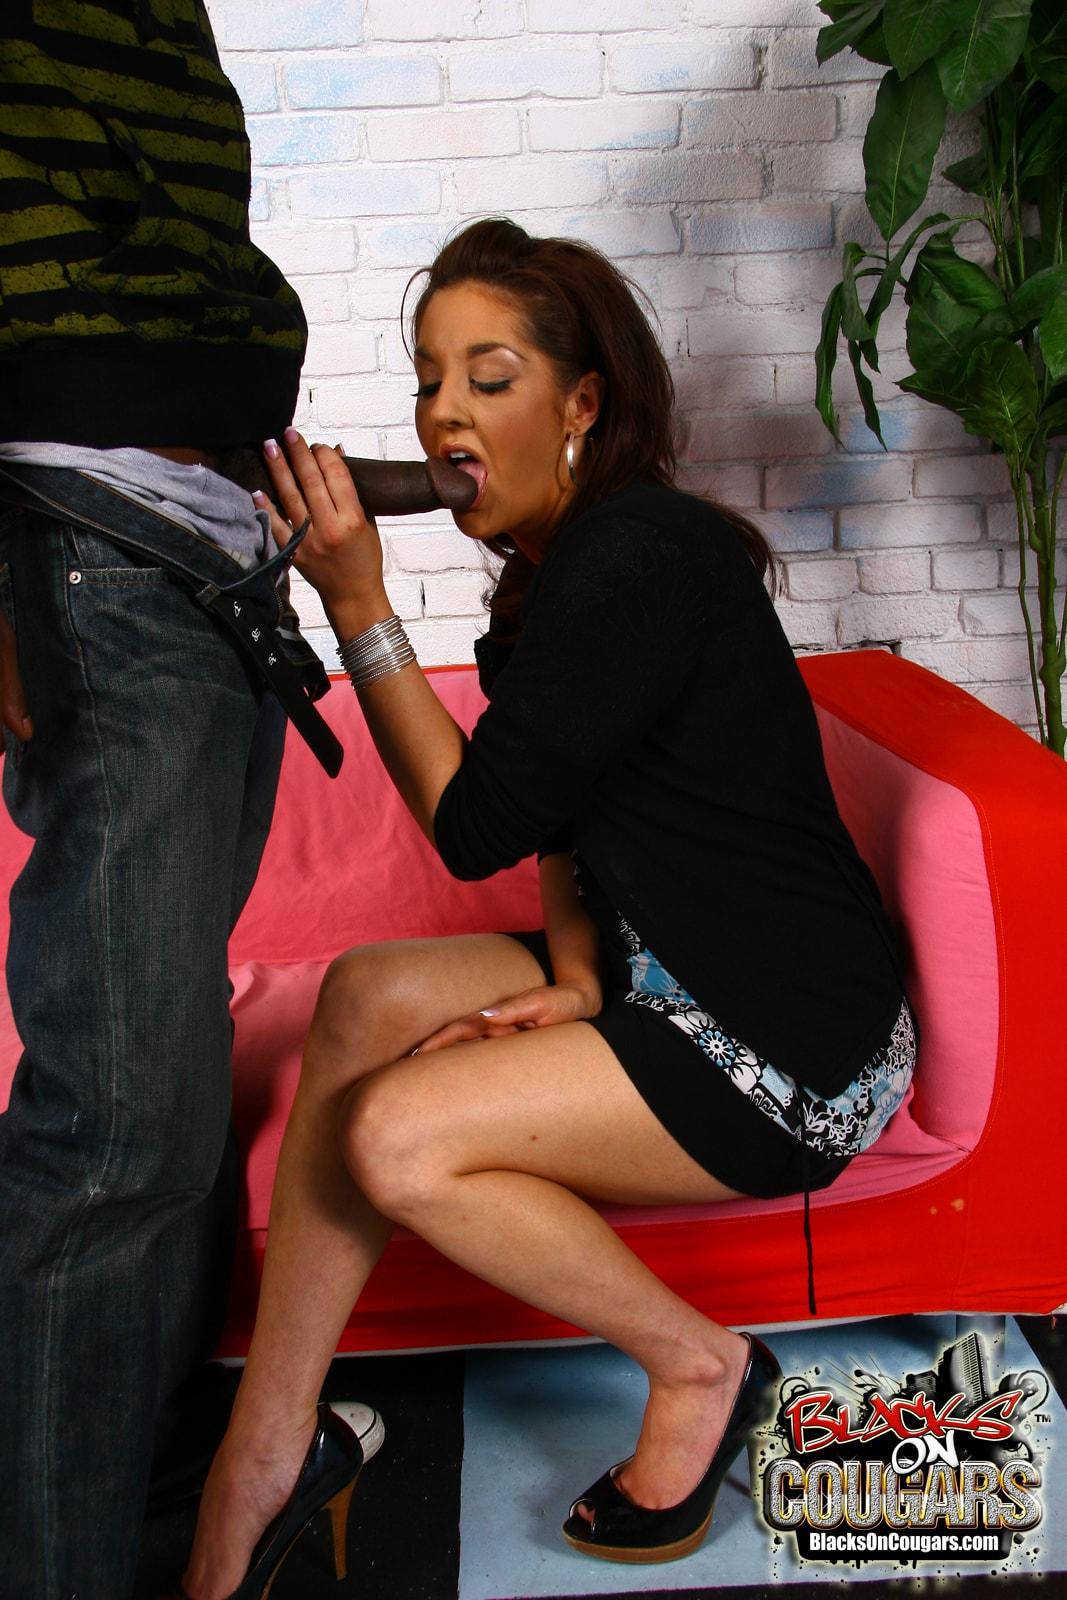 Dogfart '- Blacks On Cougars' starring Bobbi Lennox (Photo 12)